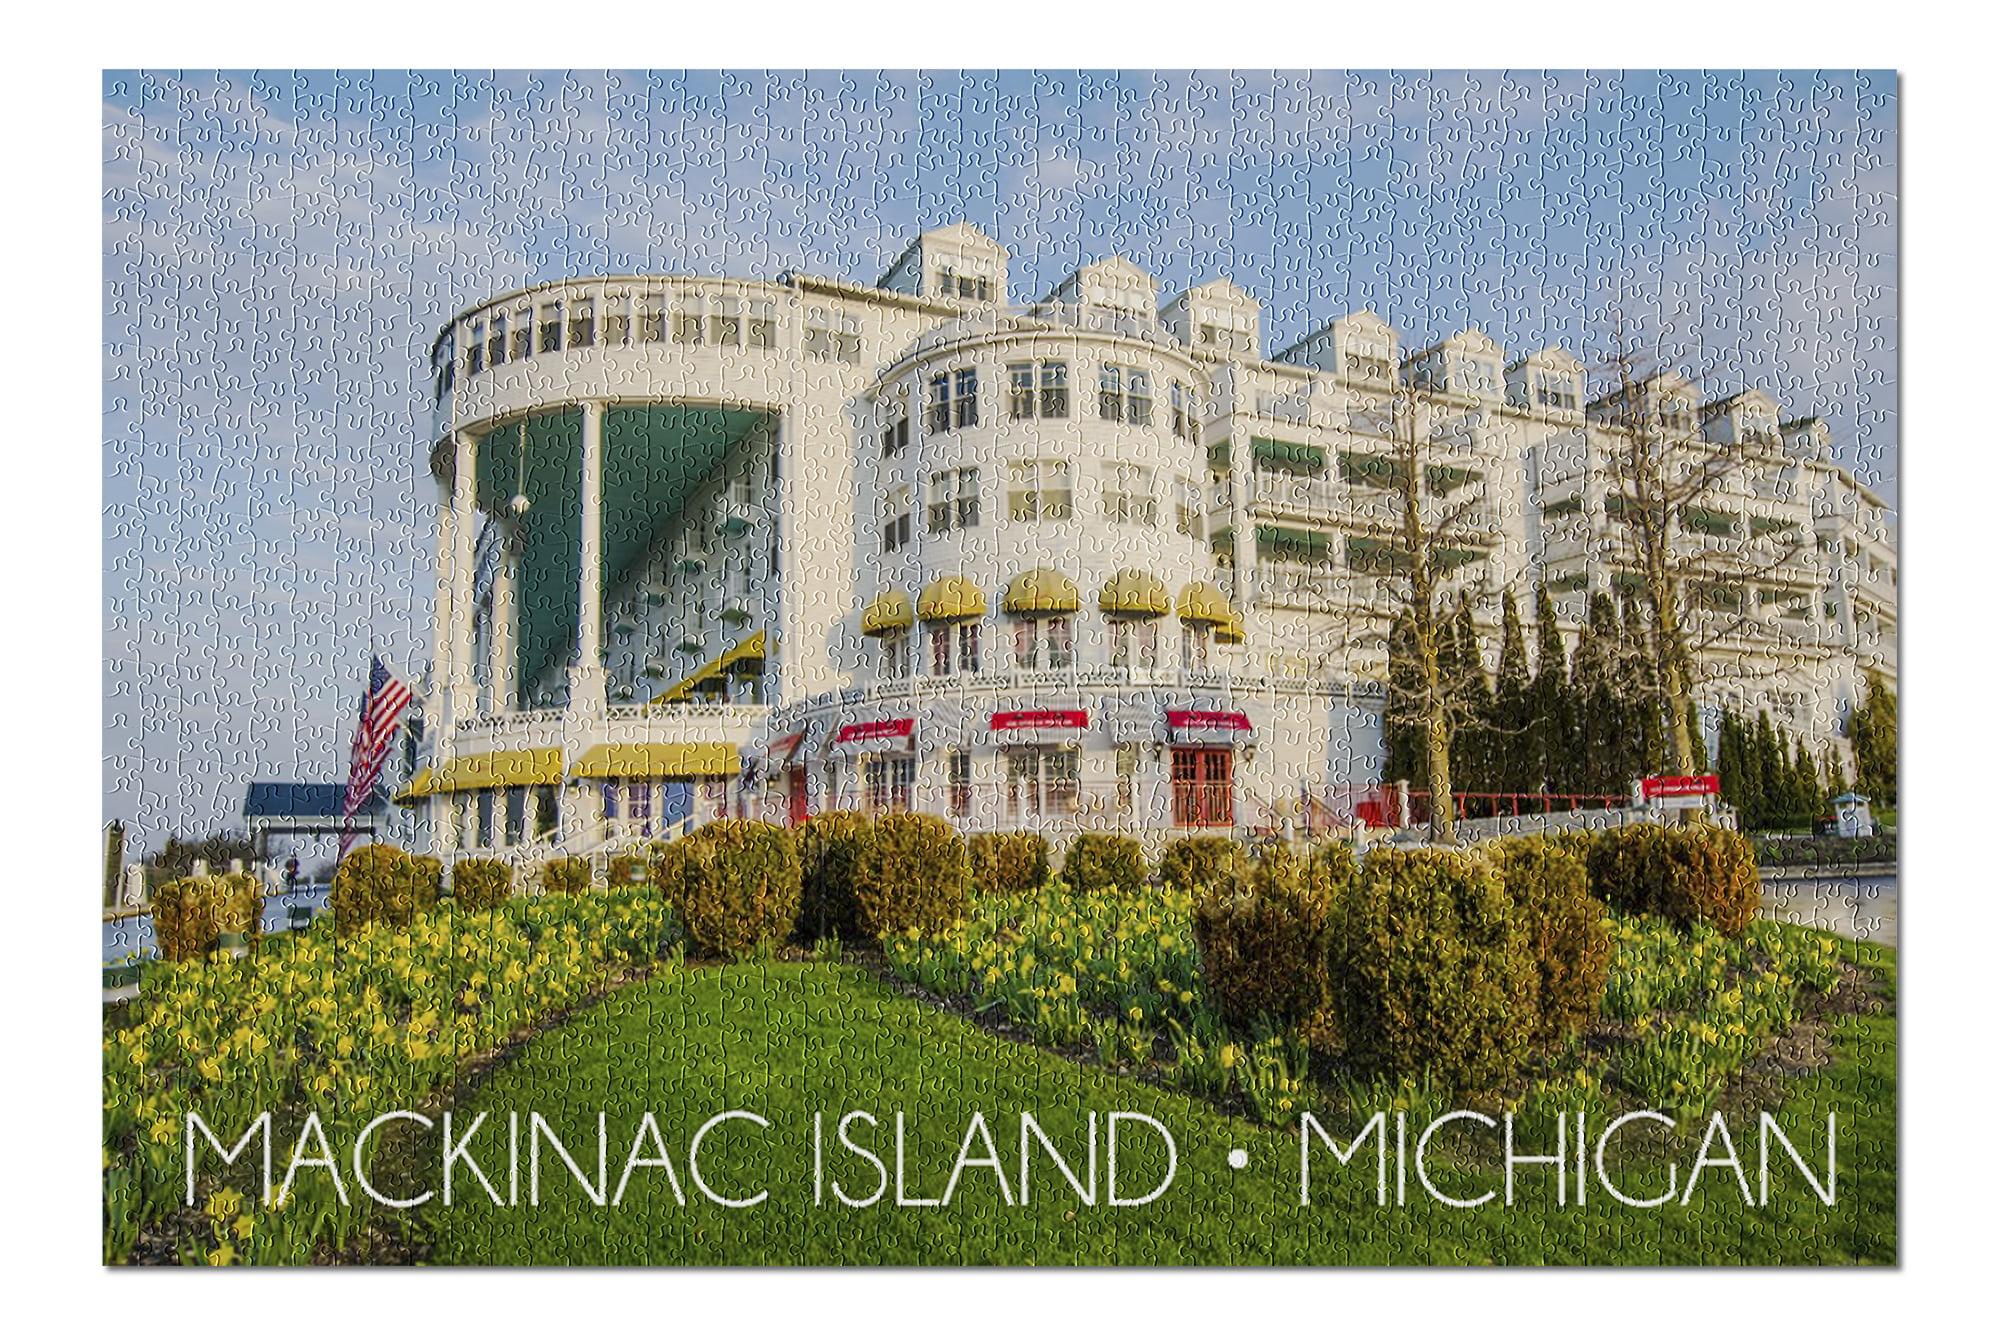 Mackinac Island Michigan Grand Hotel 20x30 Premium 1000 Piece Jigsaw Puzzle Made In Usa Walmart Com Walmart Com